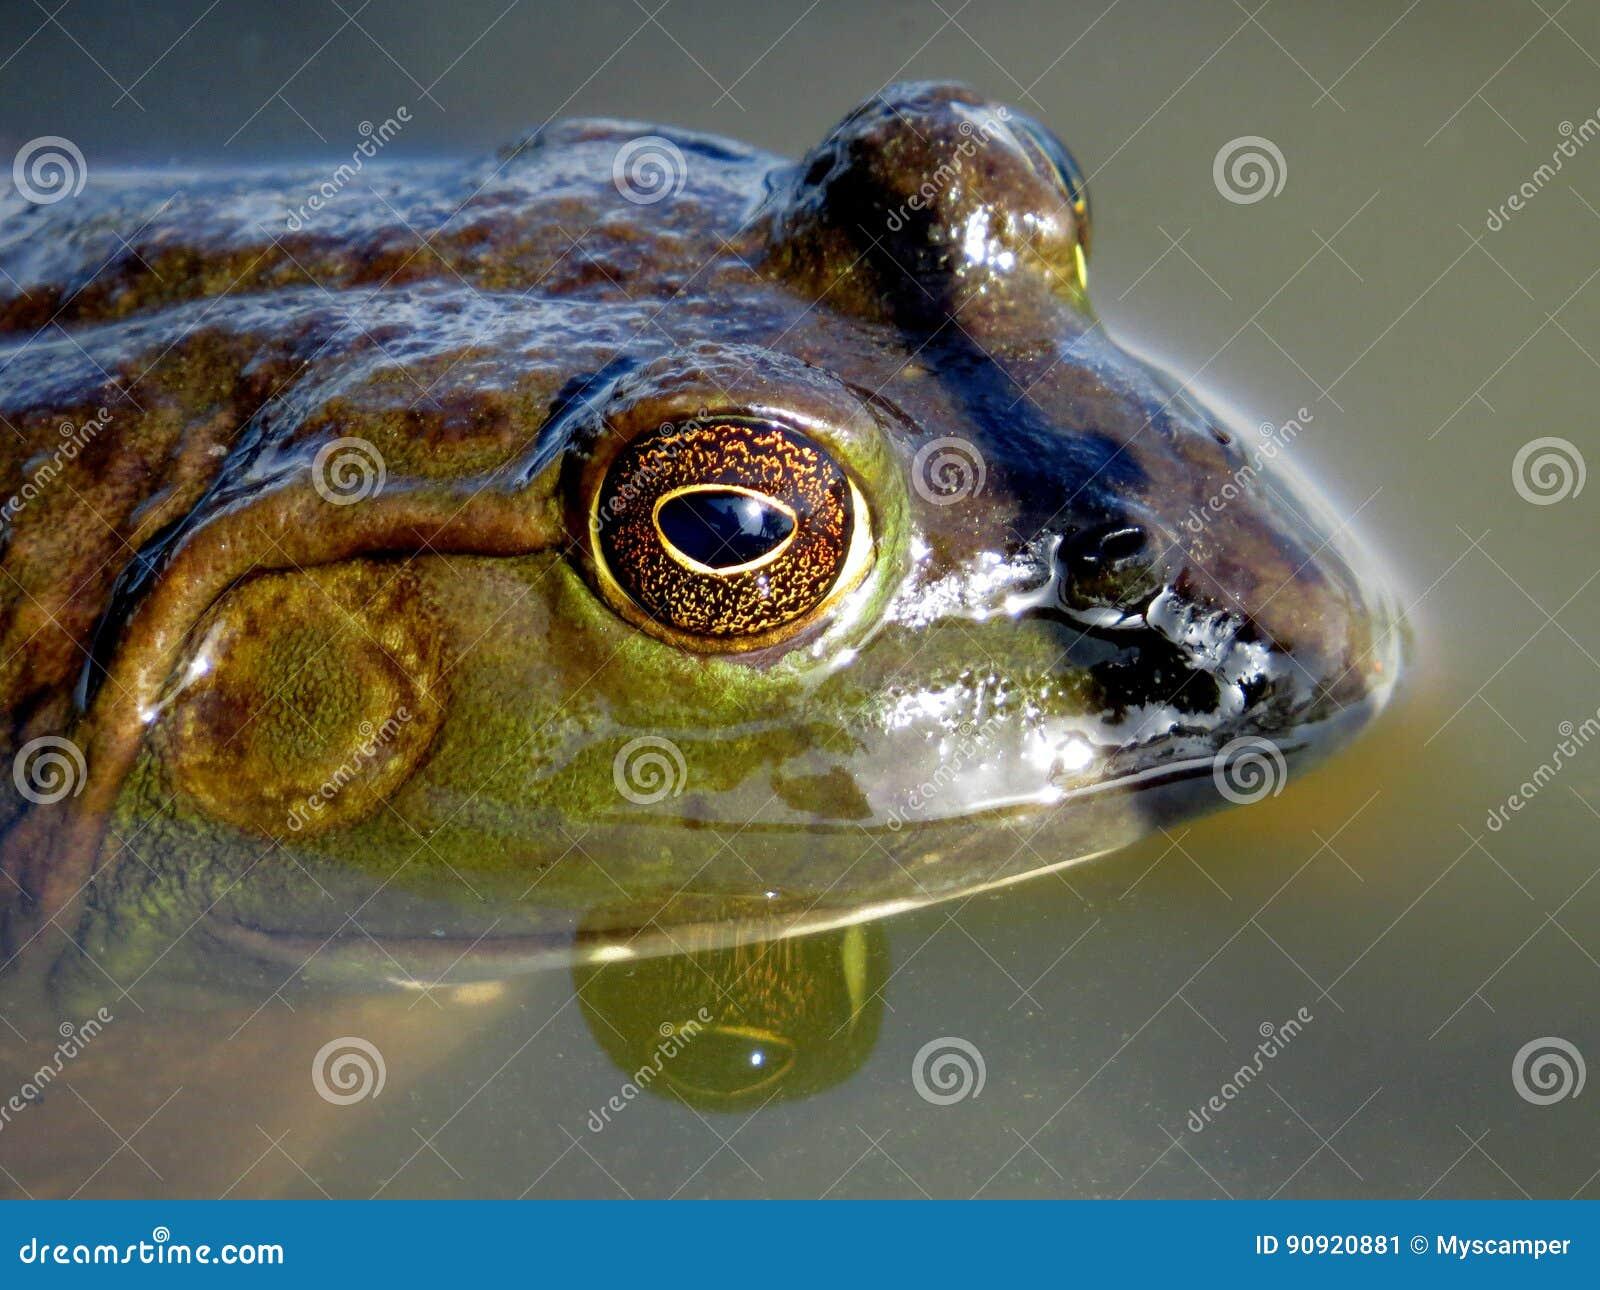 Profil américain de grenouille mugissante